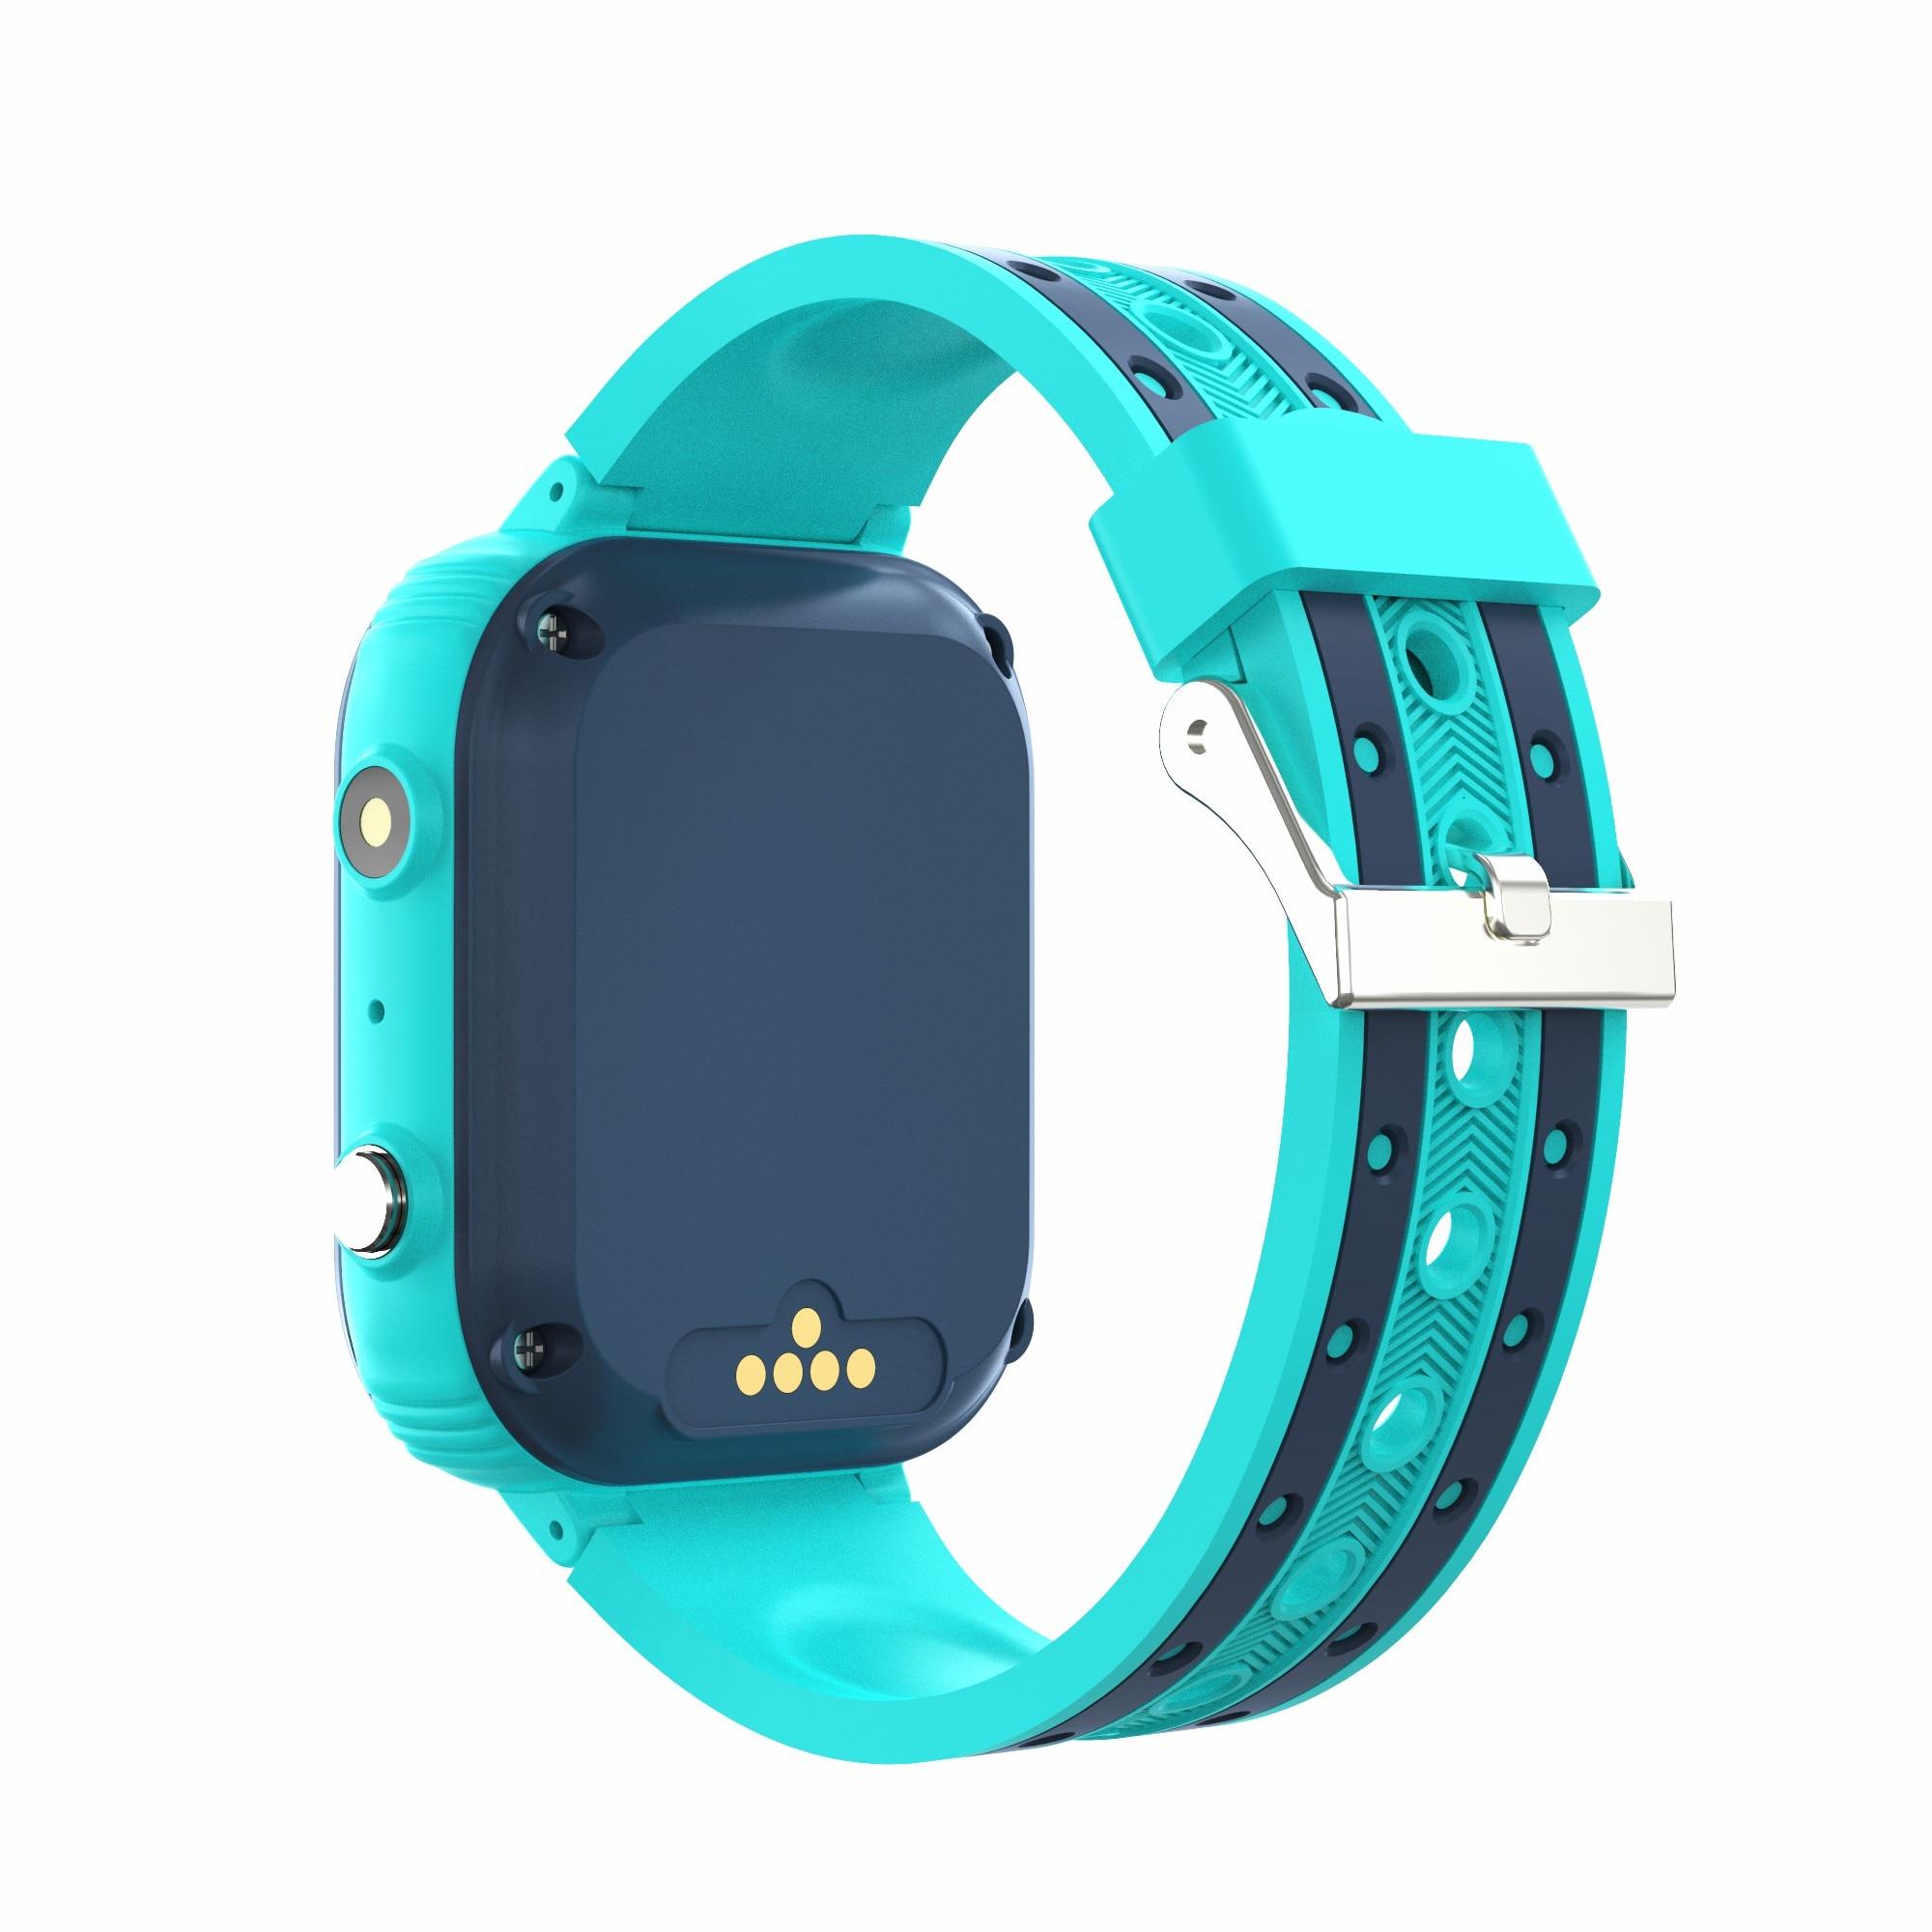 H184c72772220450a8c4267f7d4c13b24g LT21 4G Smart Watch Kids GPS WIFI Video Call SOS IP67 Waterproof Child Smartwatch Camera Monitor Tracker Location Phone Watch